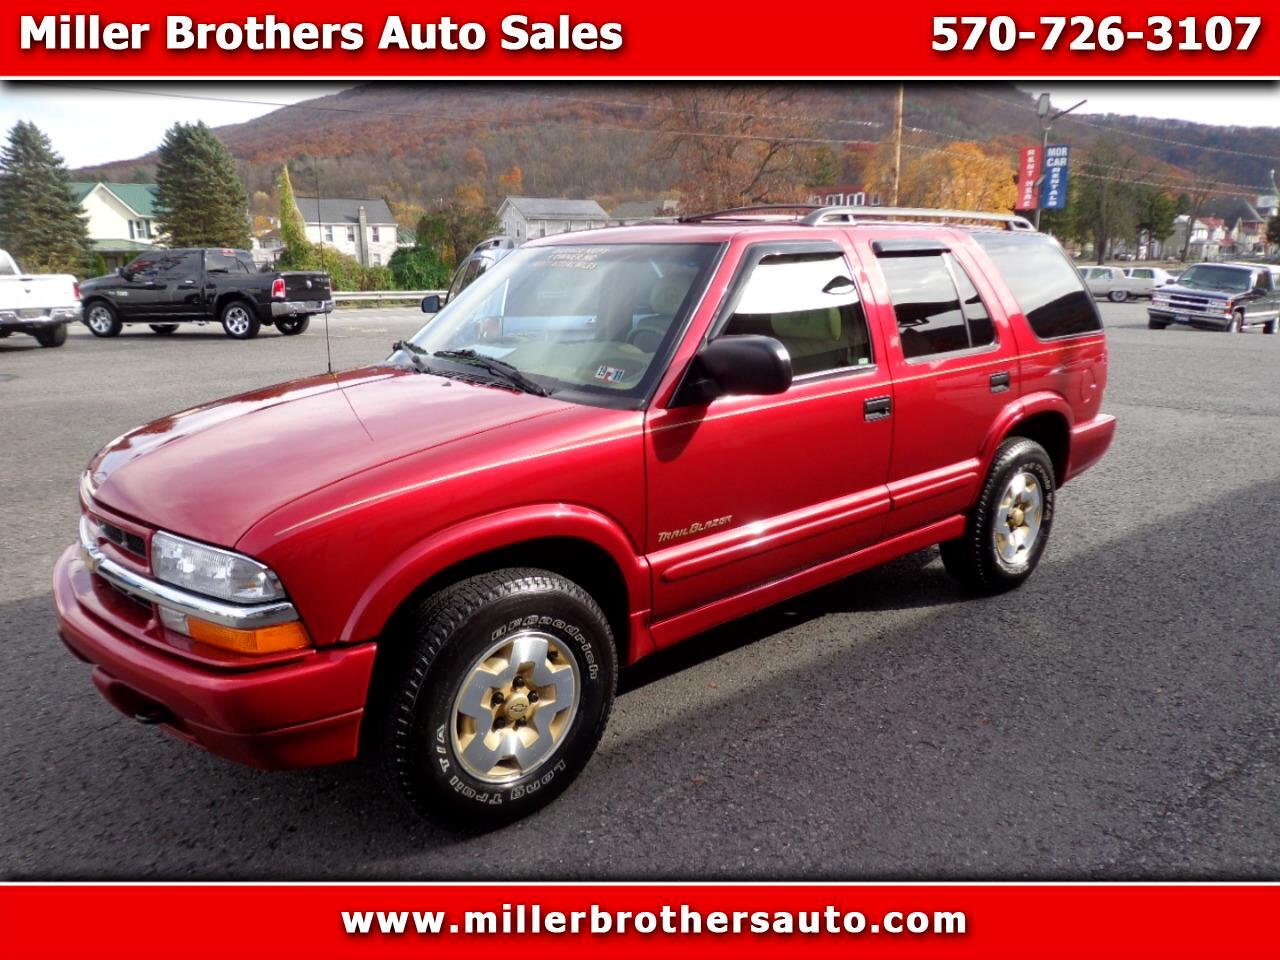 2001 Chevrolet Blazer TrailBlazer 4WD